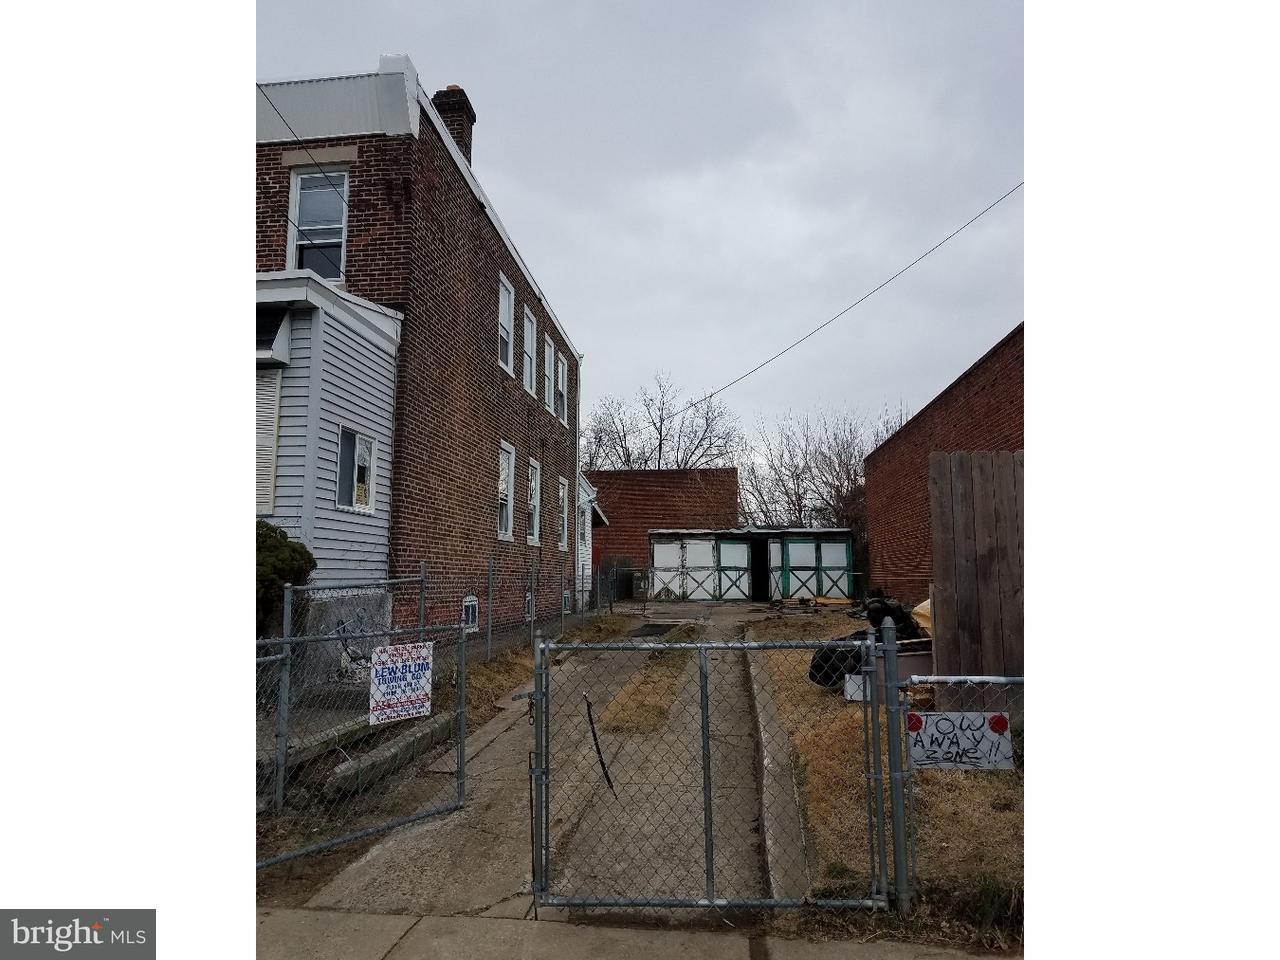 4428 E Howell Philadelphia, PA 19135